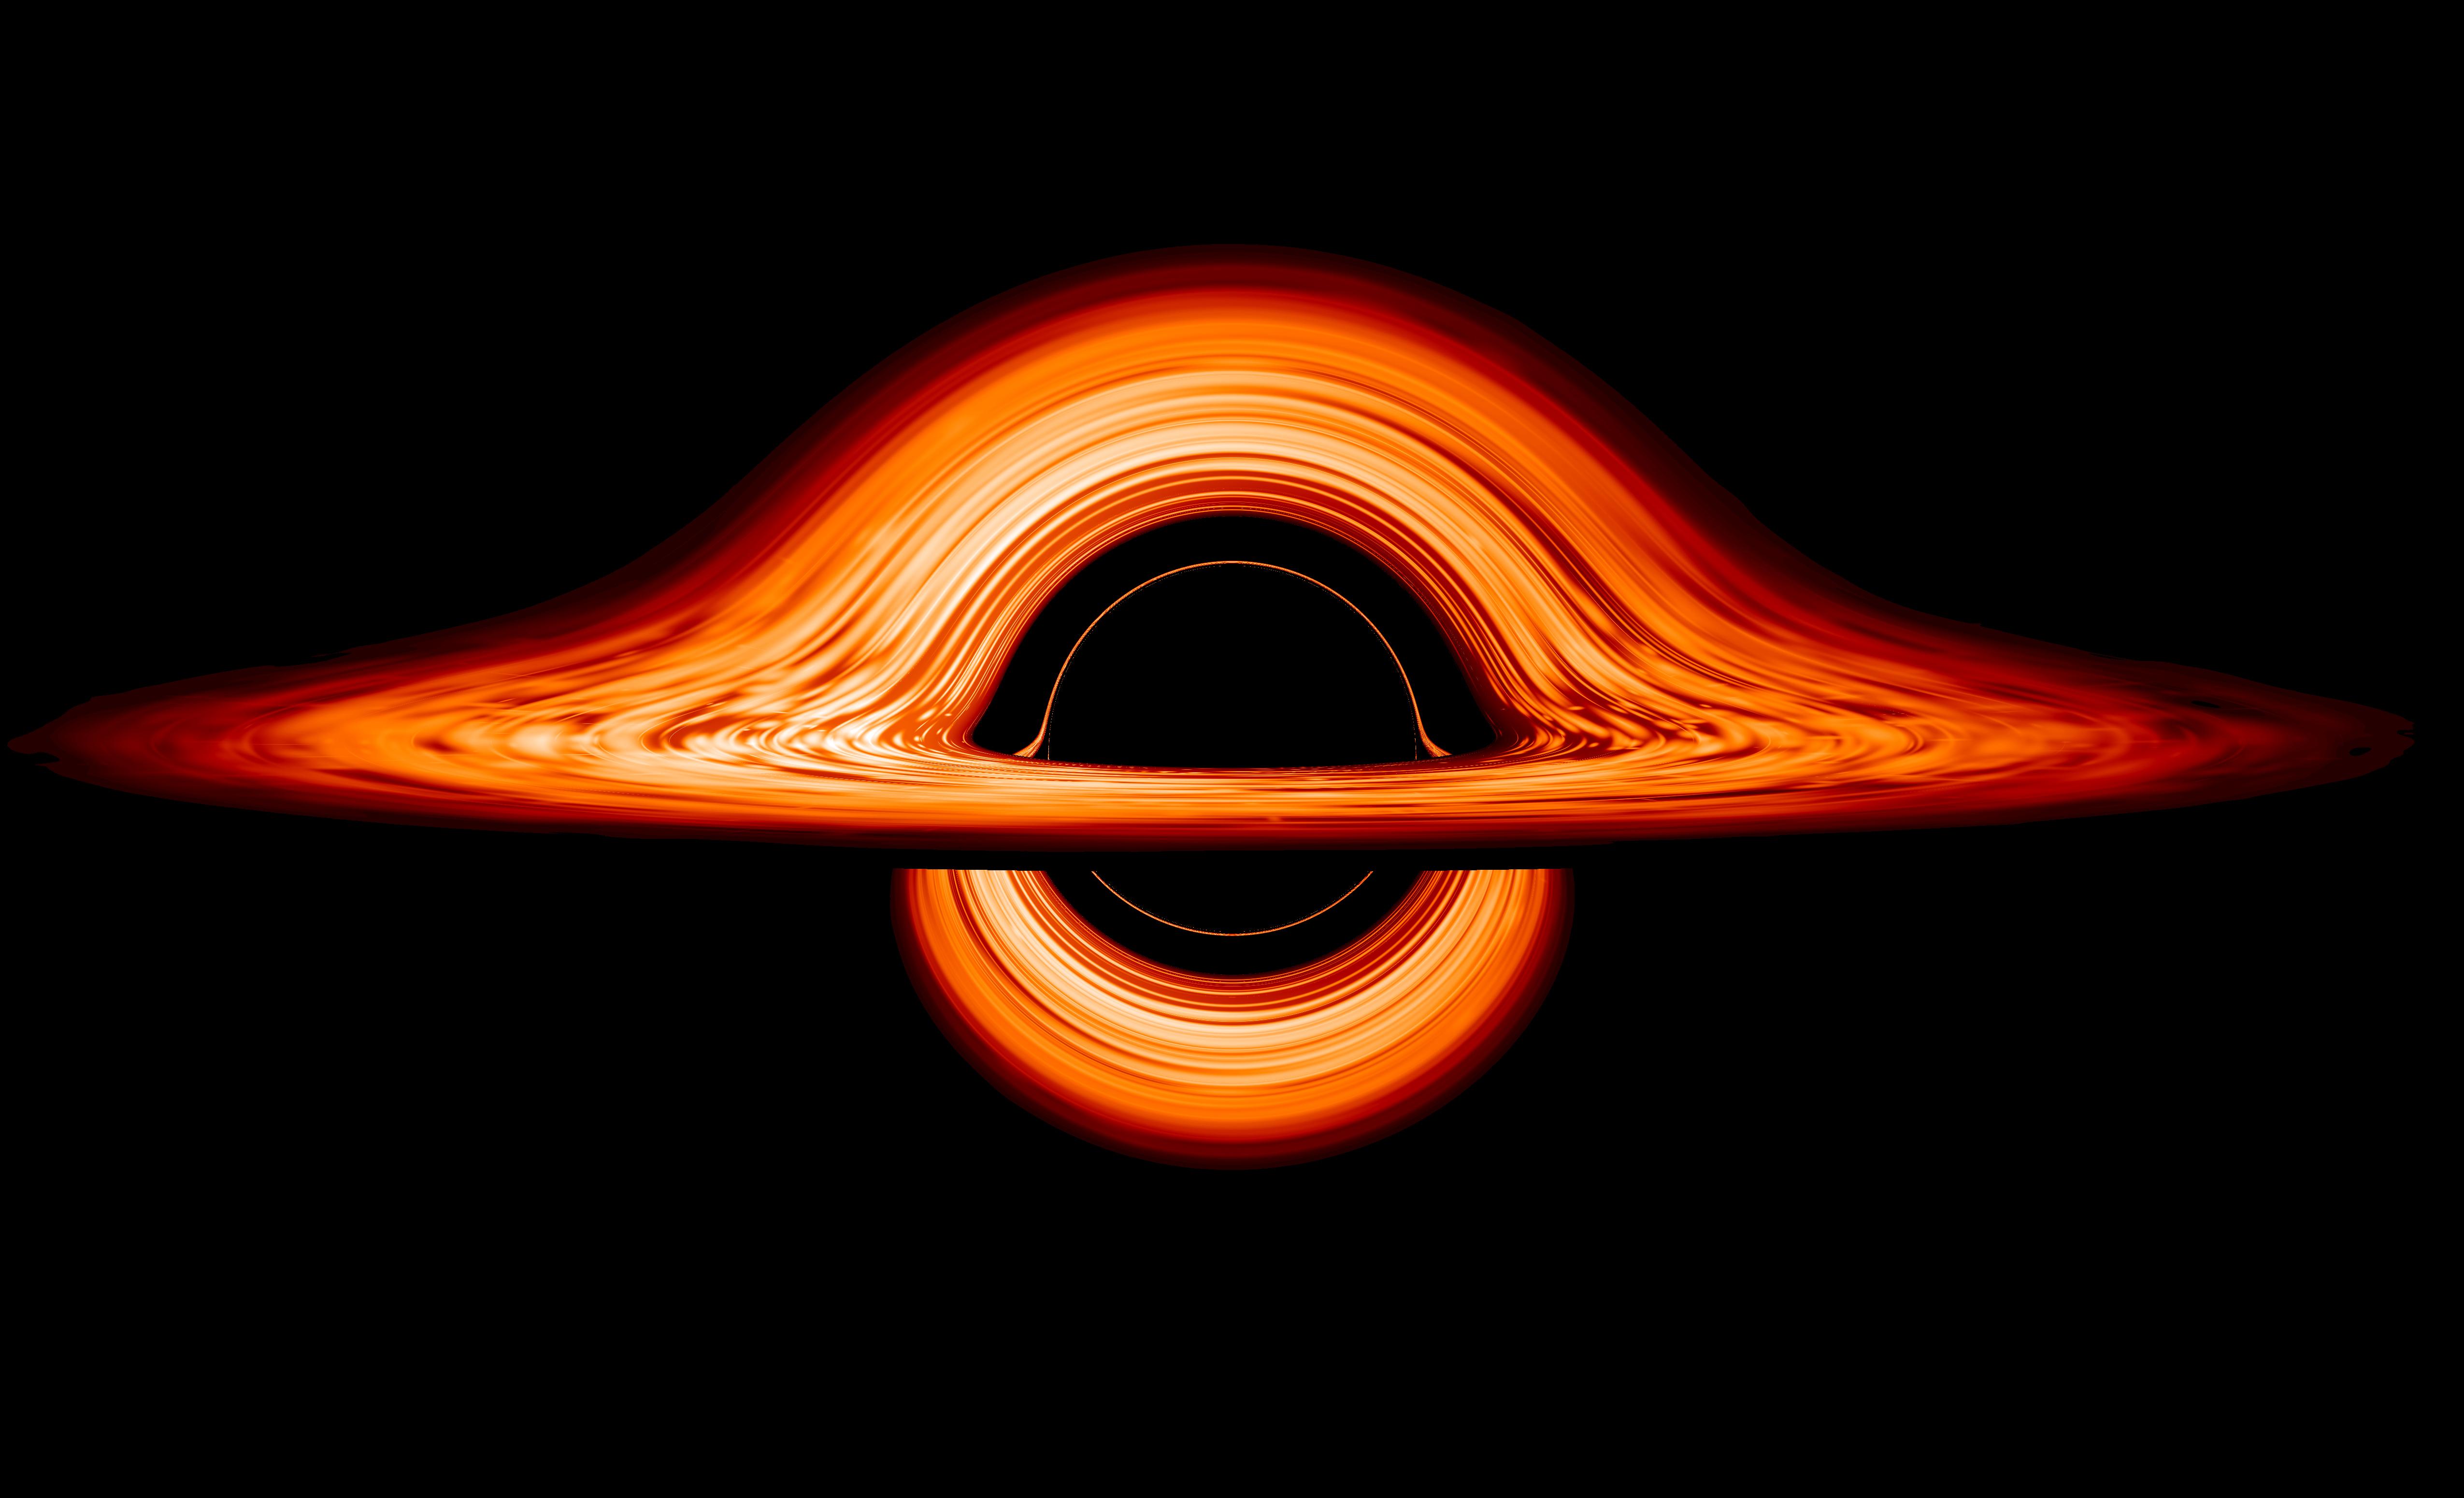 black holes lectures - photo #26